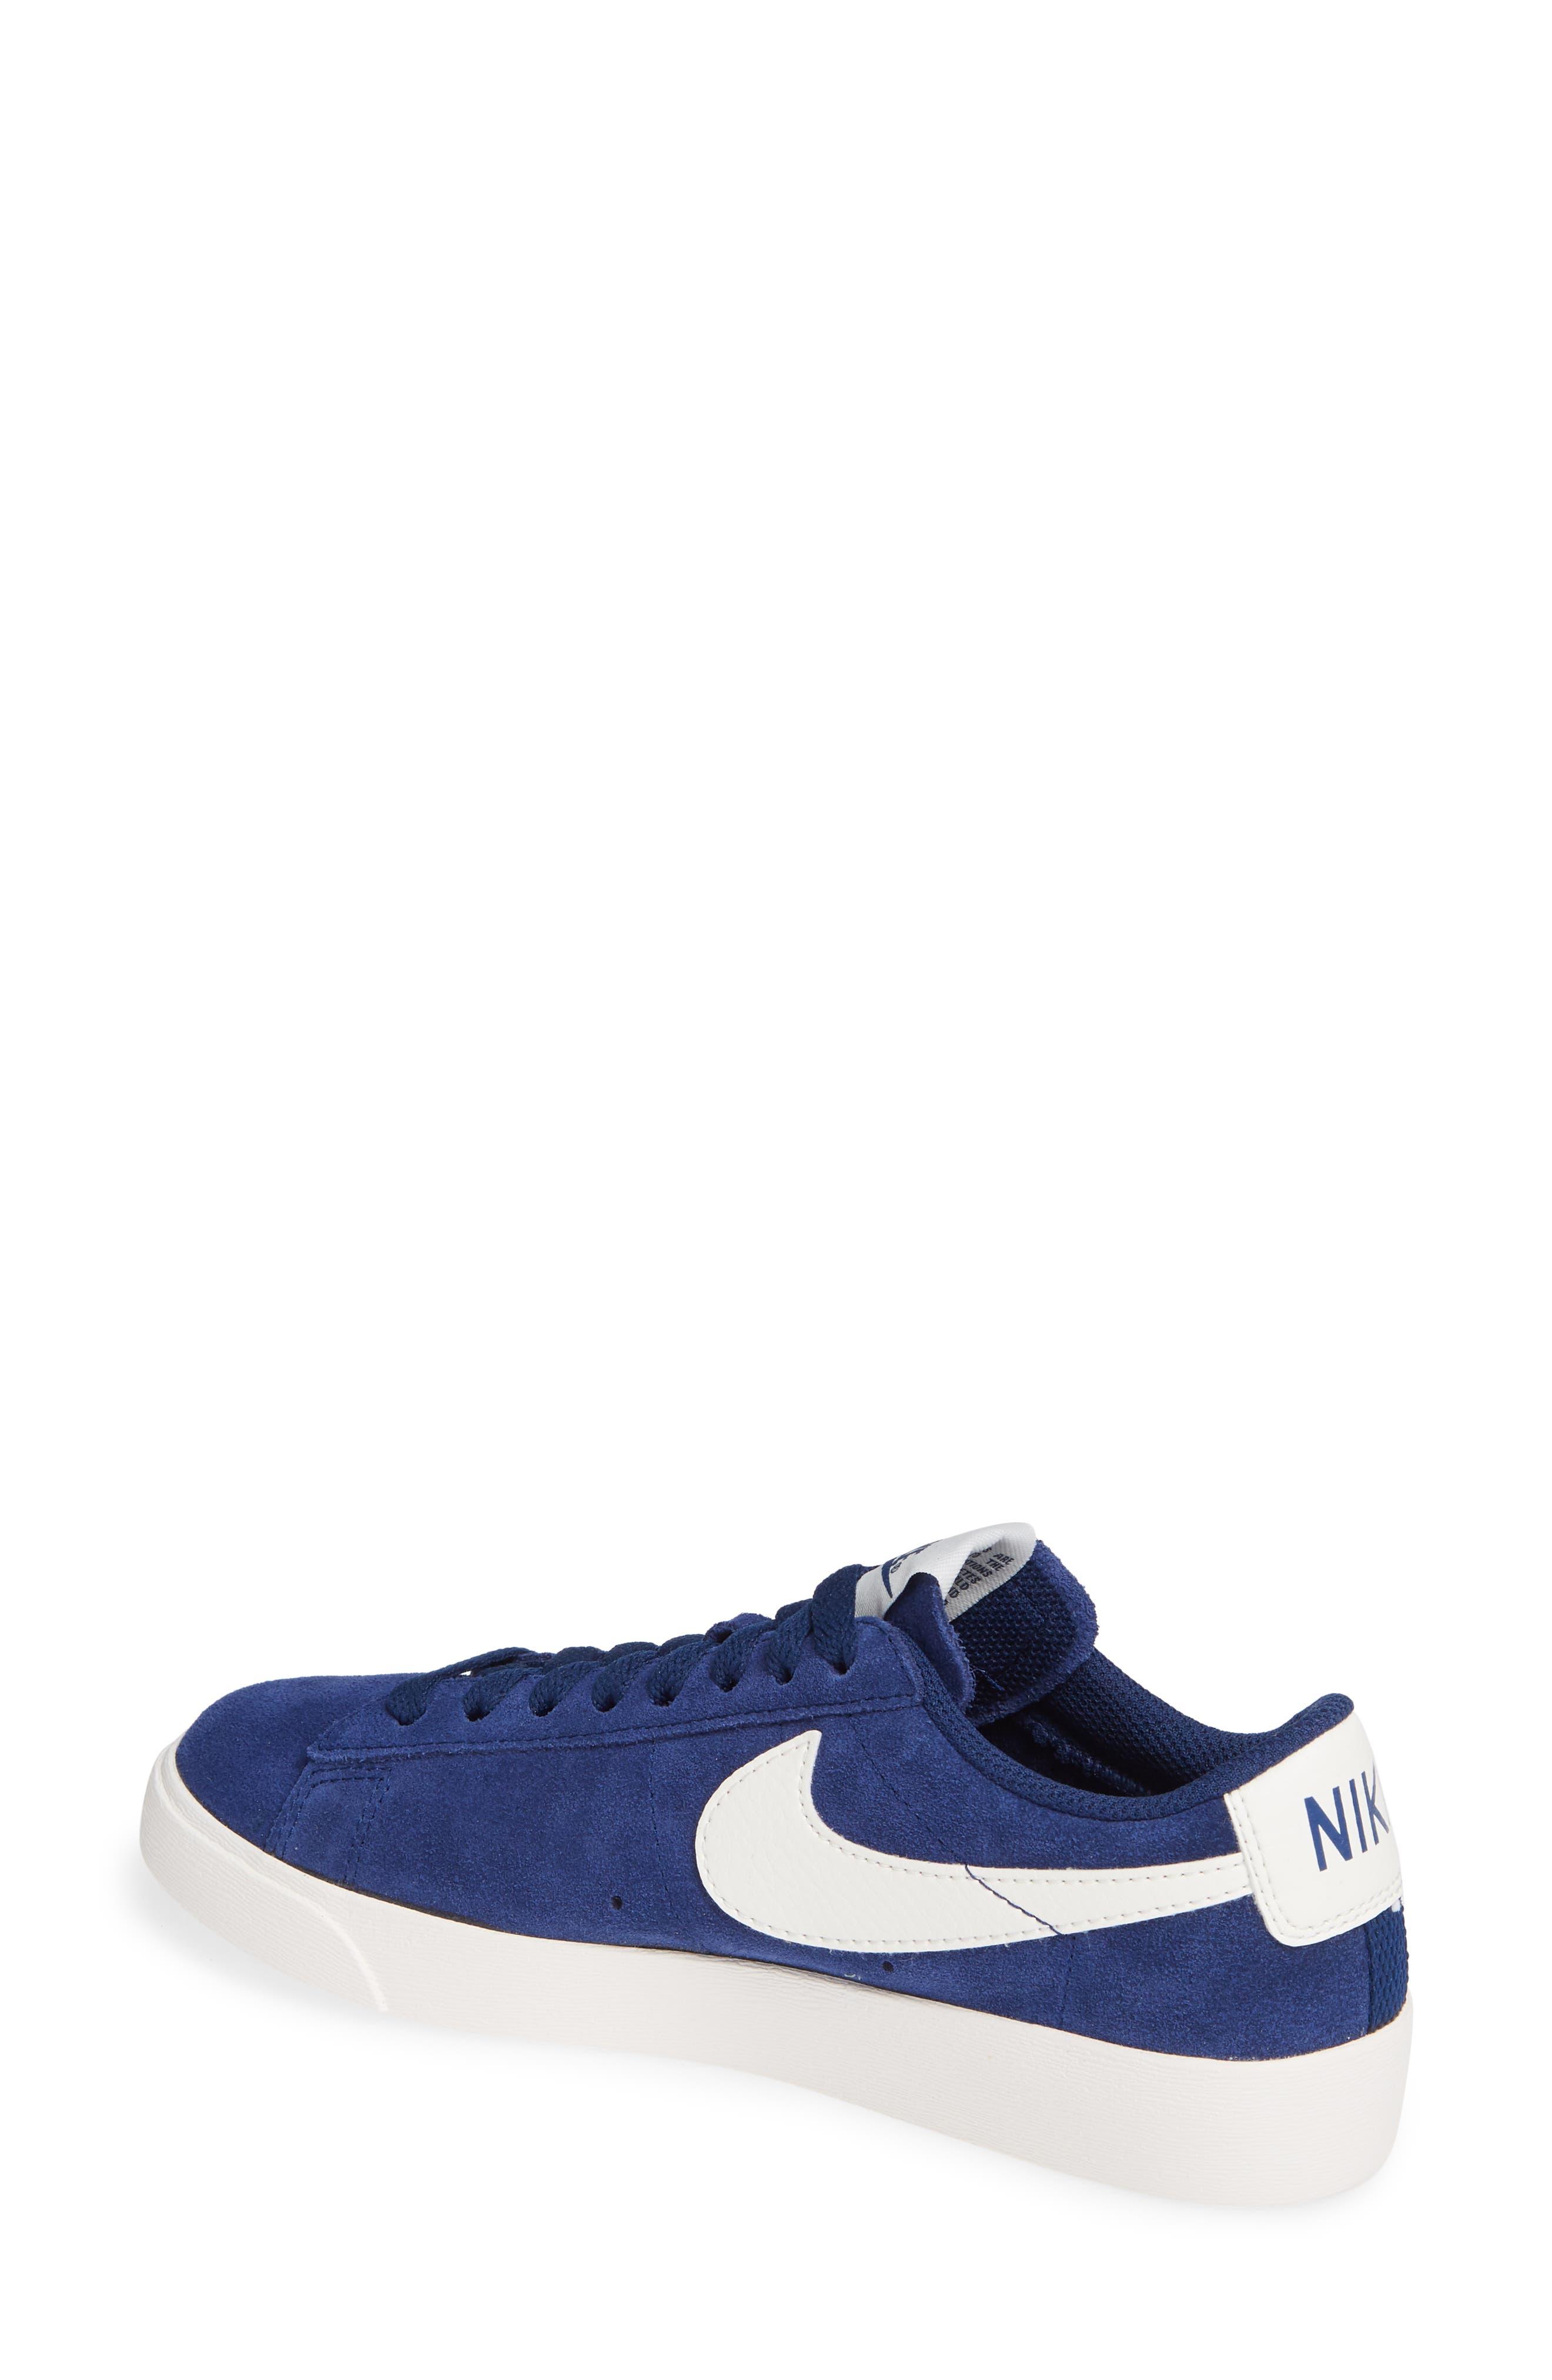 Blazer Low Sneaker,                             Alternate thumbnail 2, color,                             402